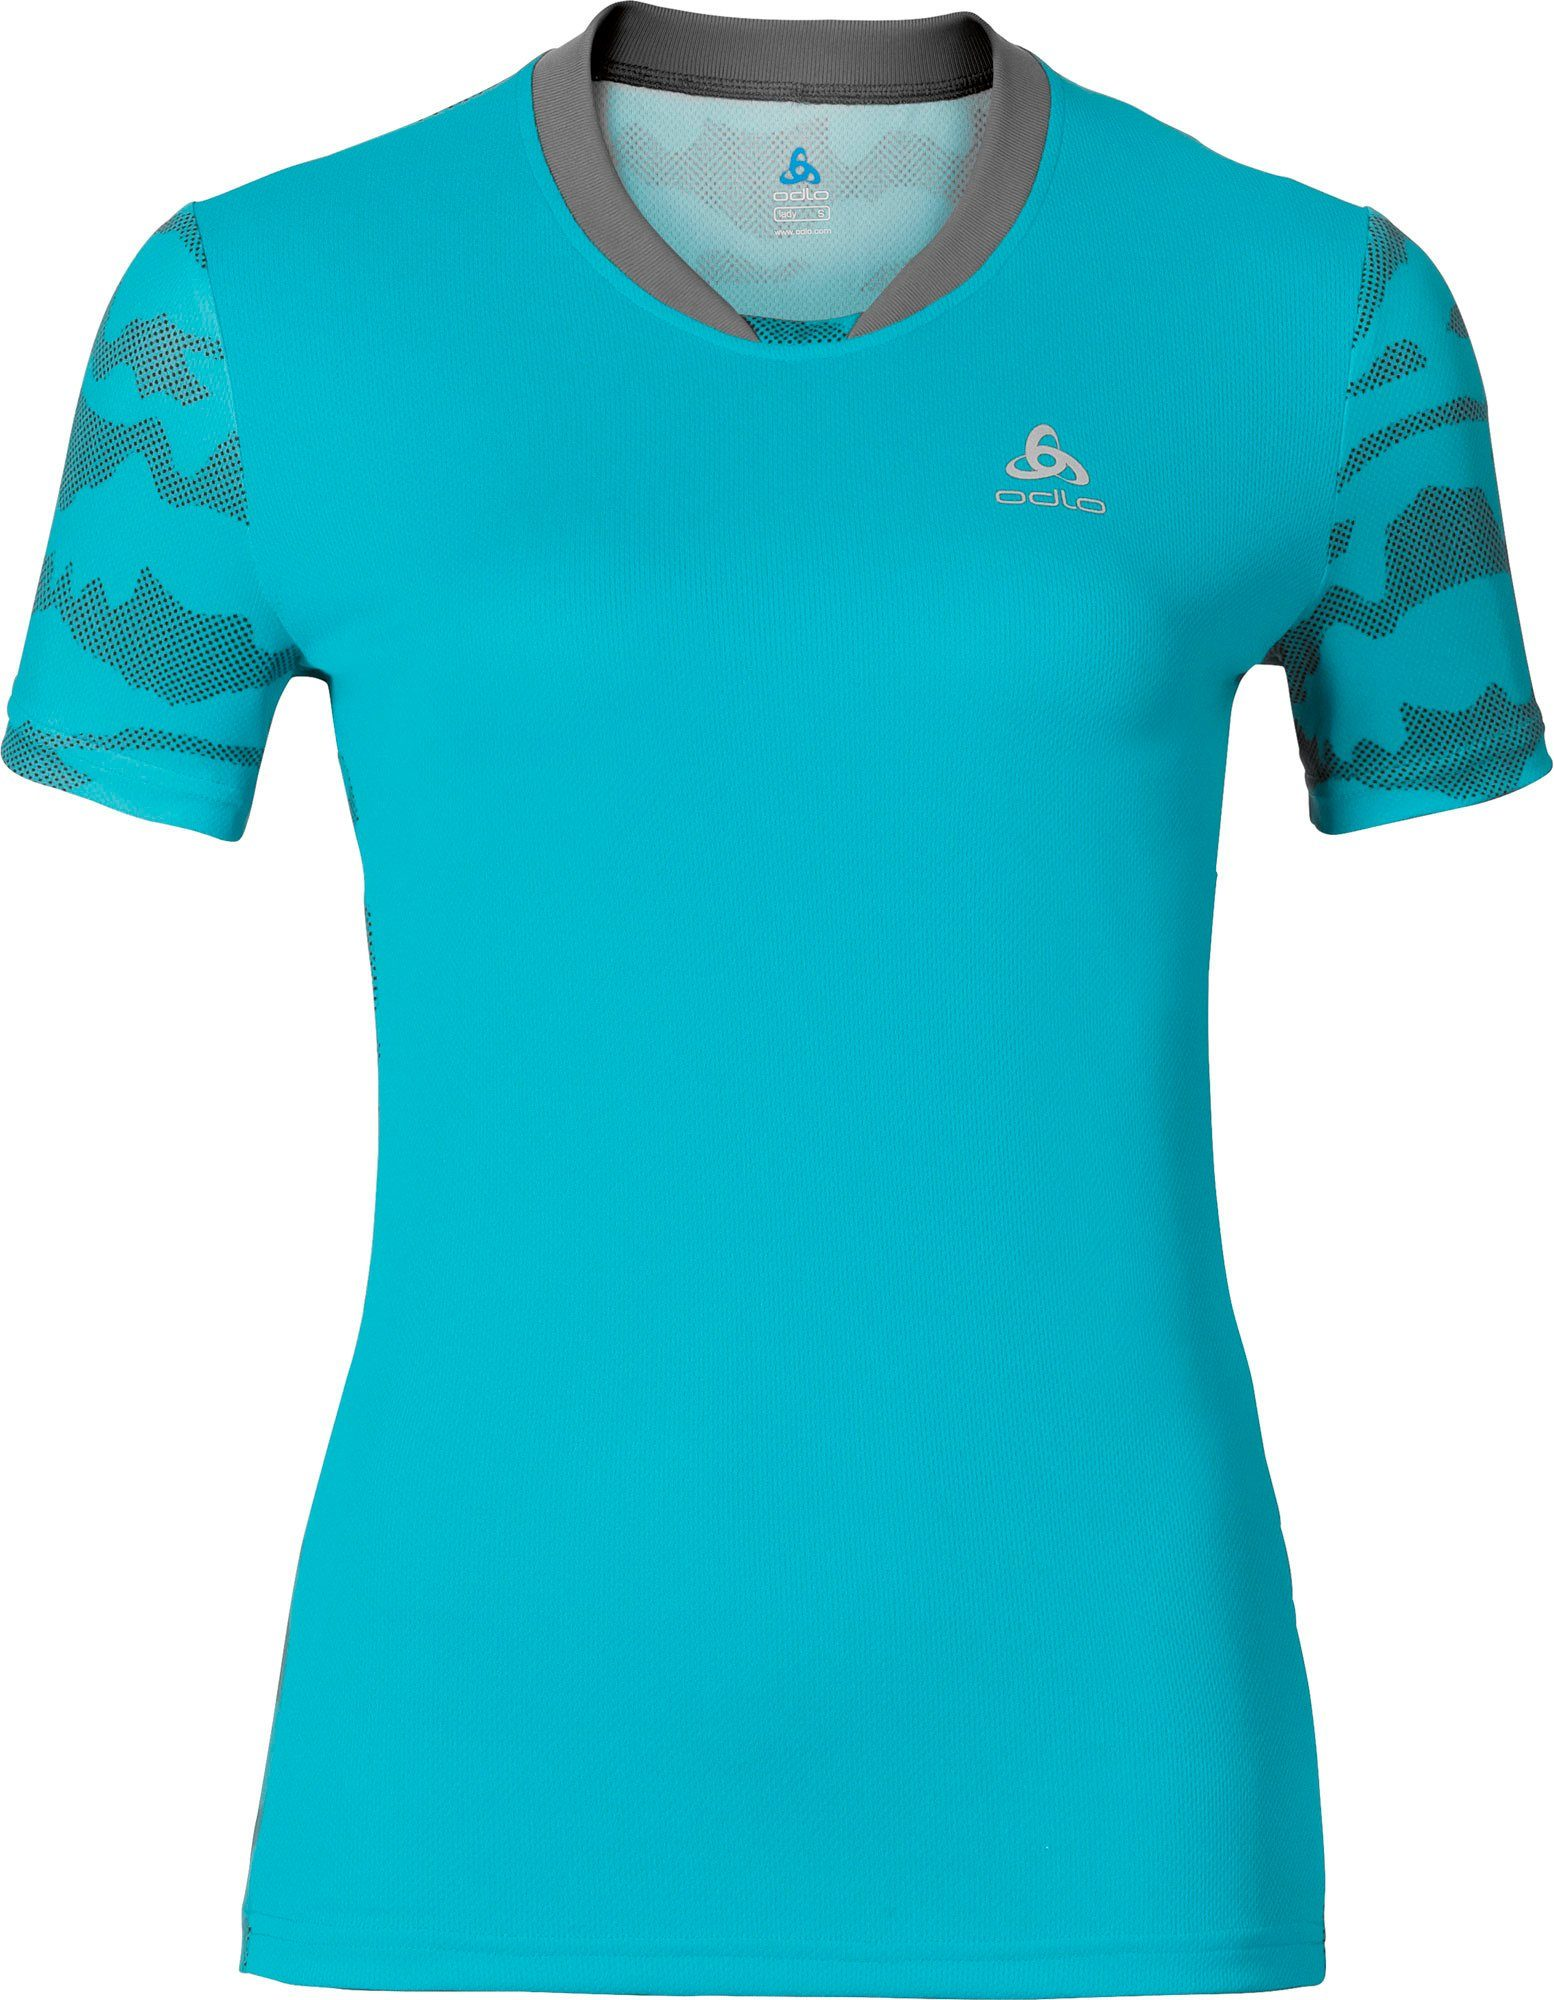 Odlo T-Shirt »Morzine Shirt S/S Women«